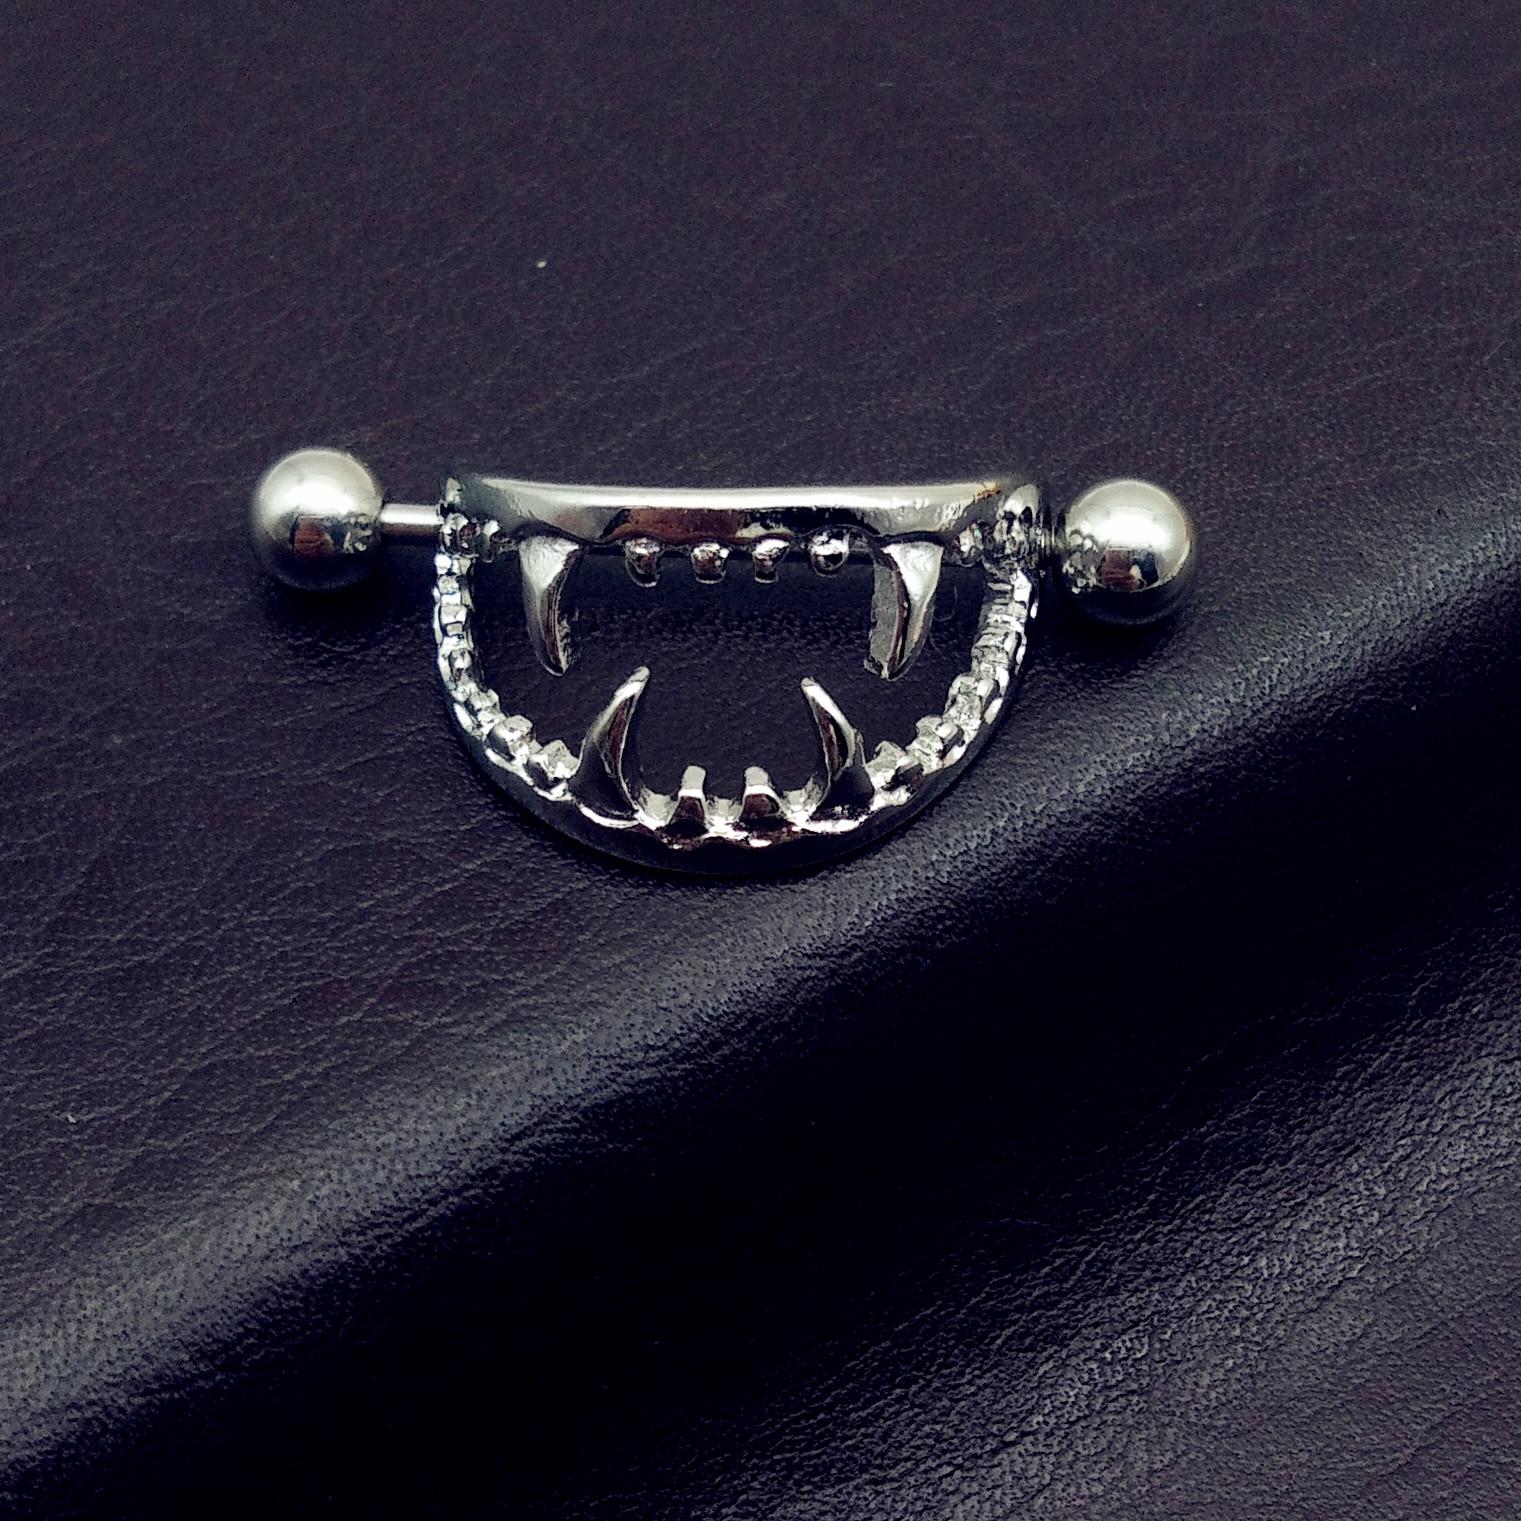 2 piece 14G Punk Rock y Love Bite Fangs Vampire Nipple Ring